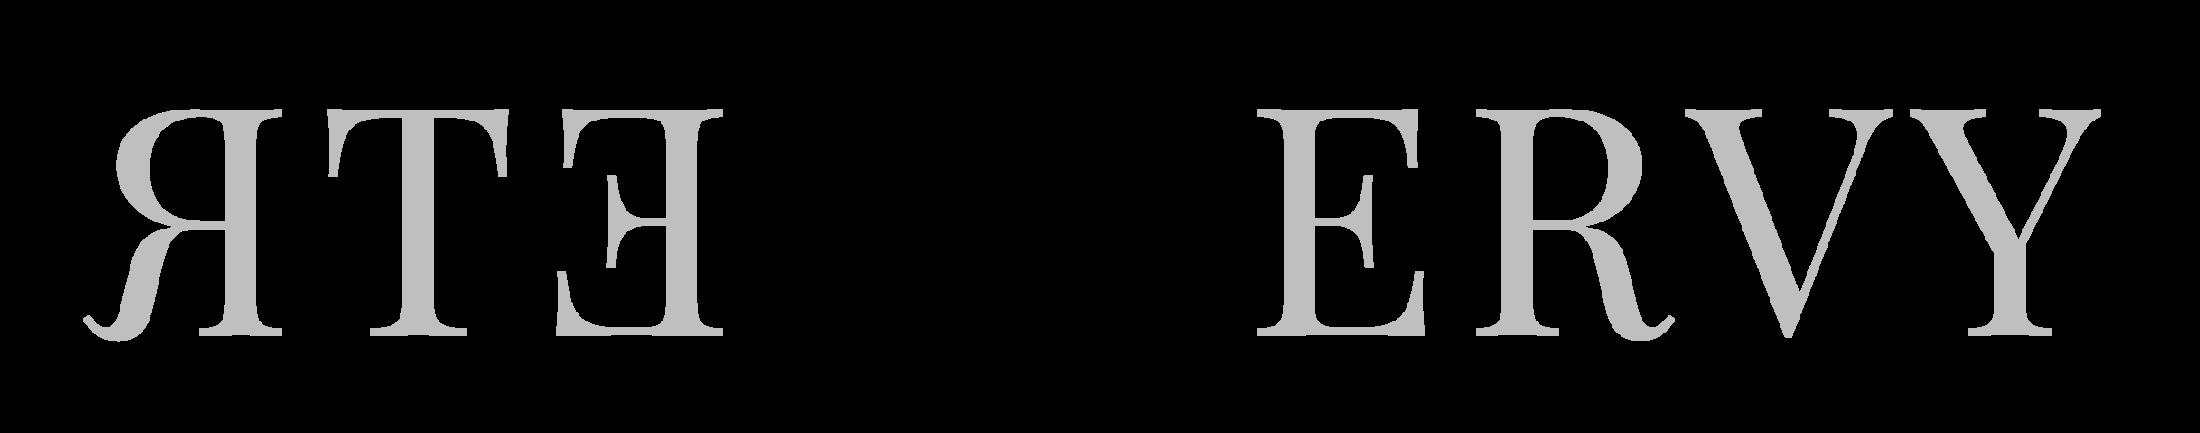 Petr Hervíř Svatební Kameraman Praha Logo